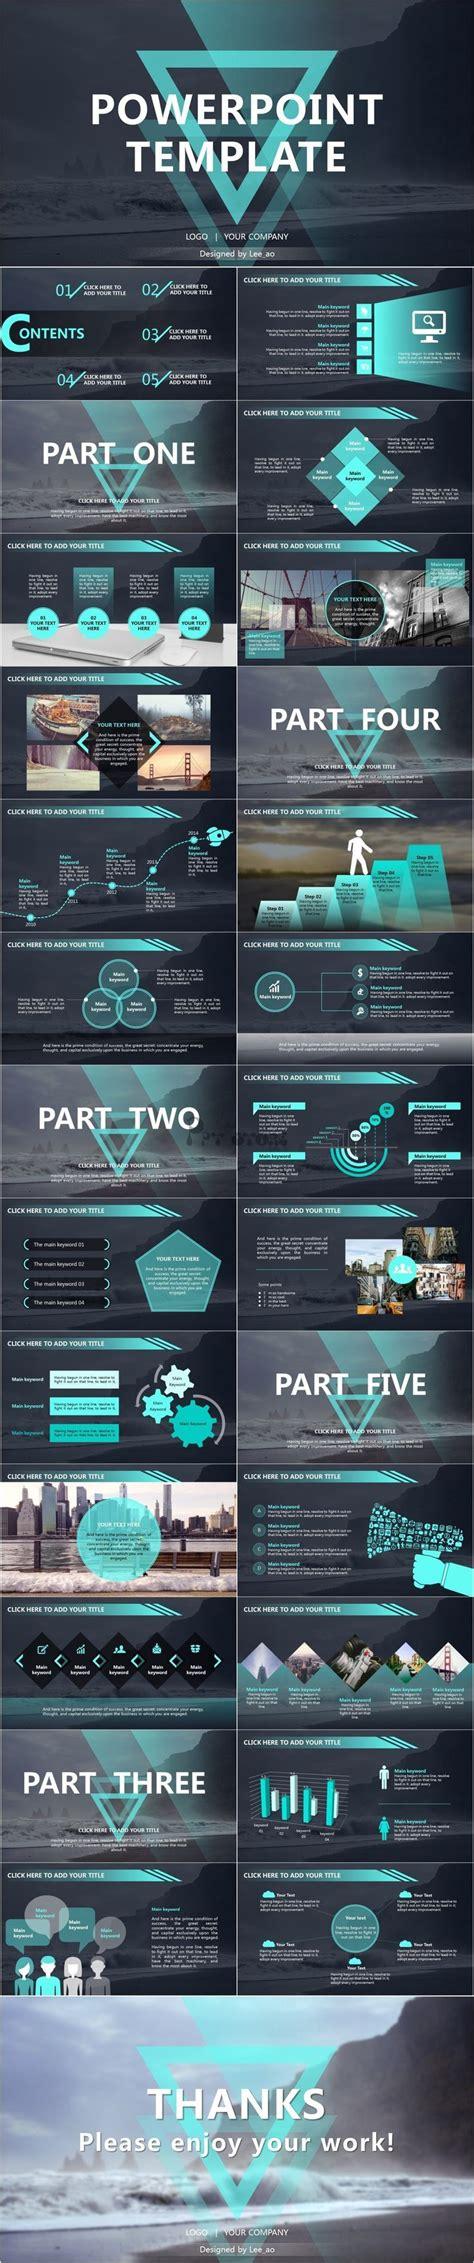 personal finance powerpoint presentation template design